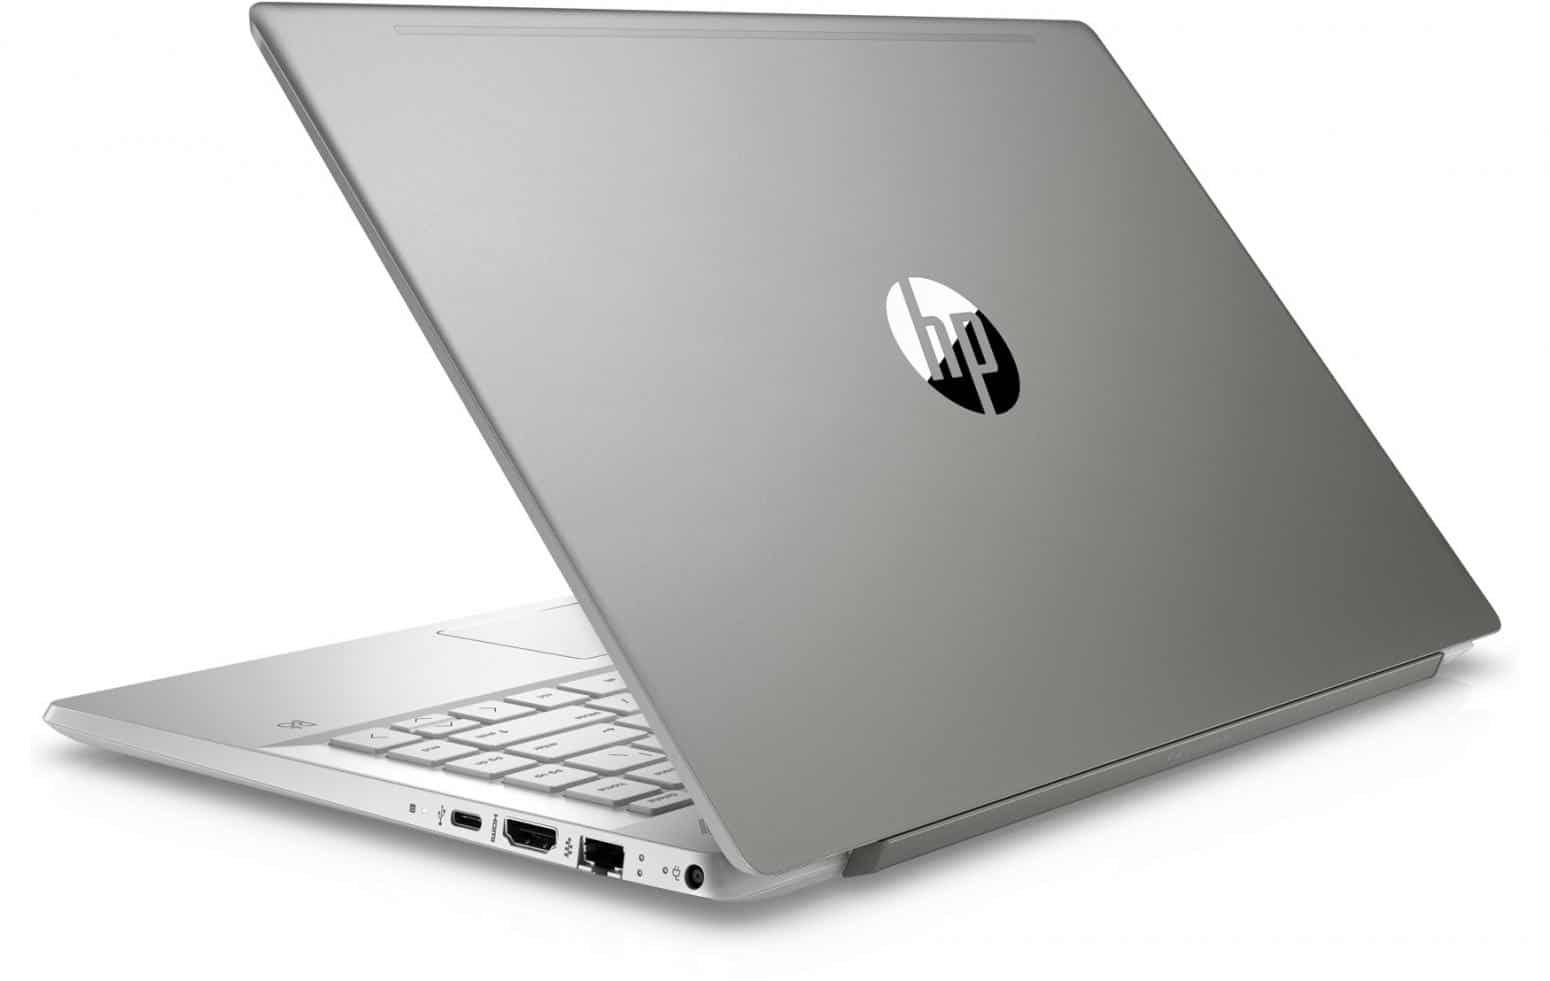 HP Pavilion 14-ce0009nf, ultrabook 14 pouces IPS i5 SSD256 (549€)